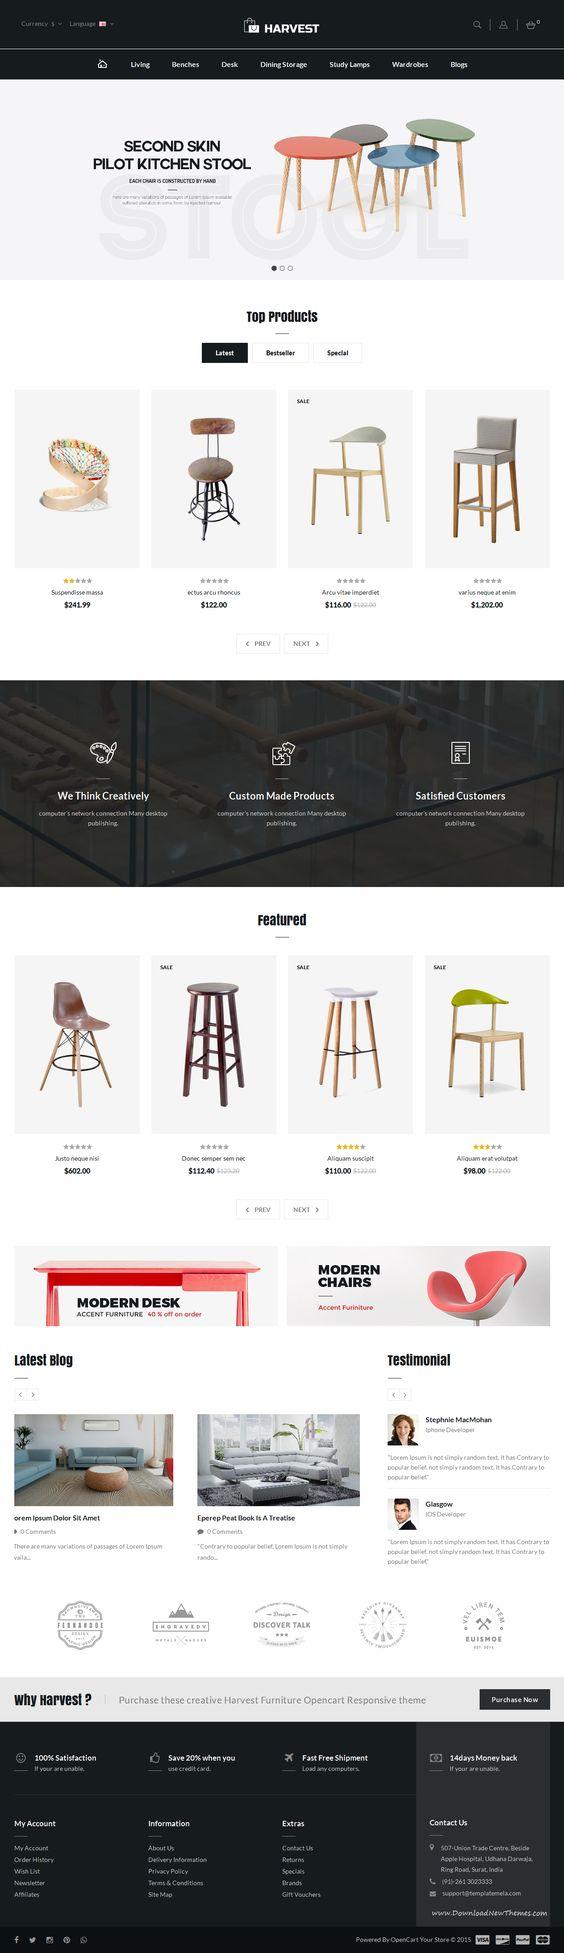 web design inspiration best creative ecommerce website themes best furniture design websites